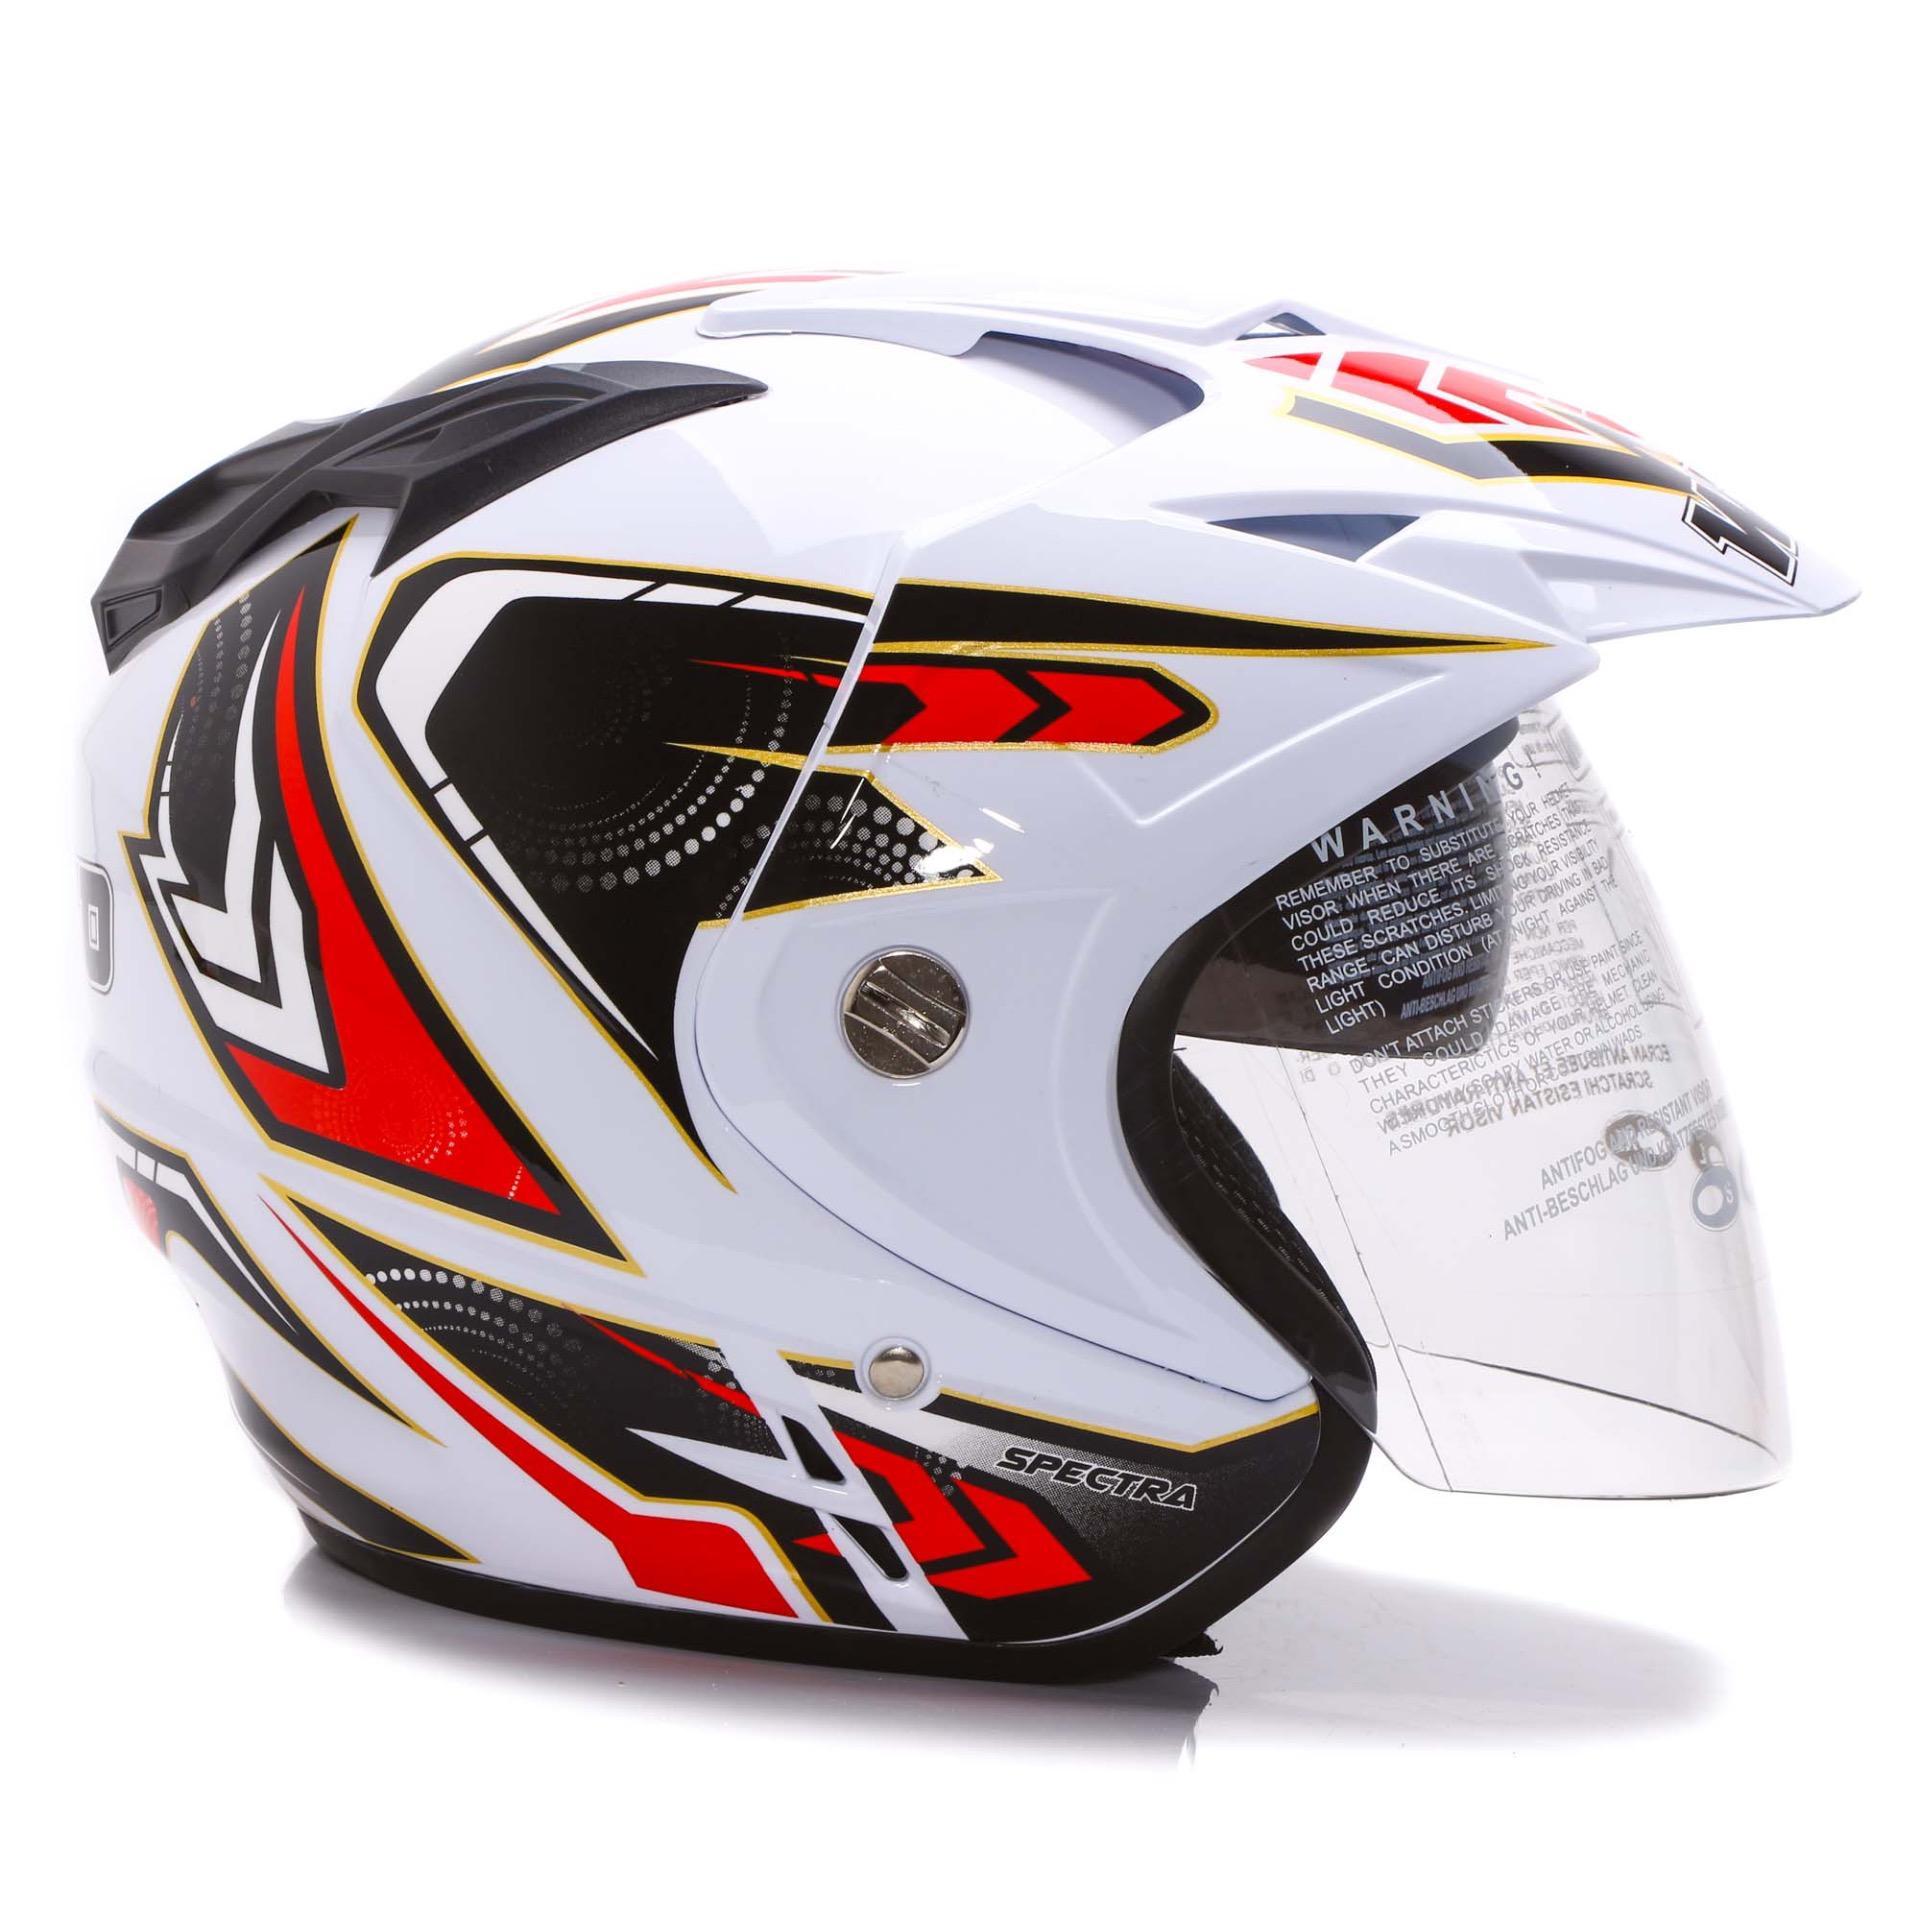 Wto Helmet Junior Neo Mc Queen Merah Spec Dan Daftar Harga Terbaru Rapunzel Ungu Impressive Spectra Putih